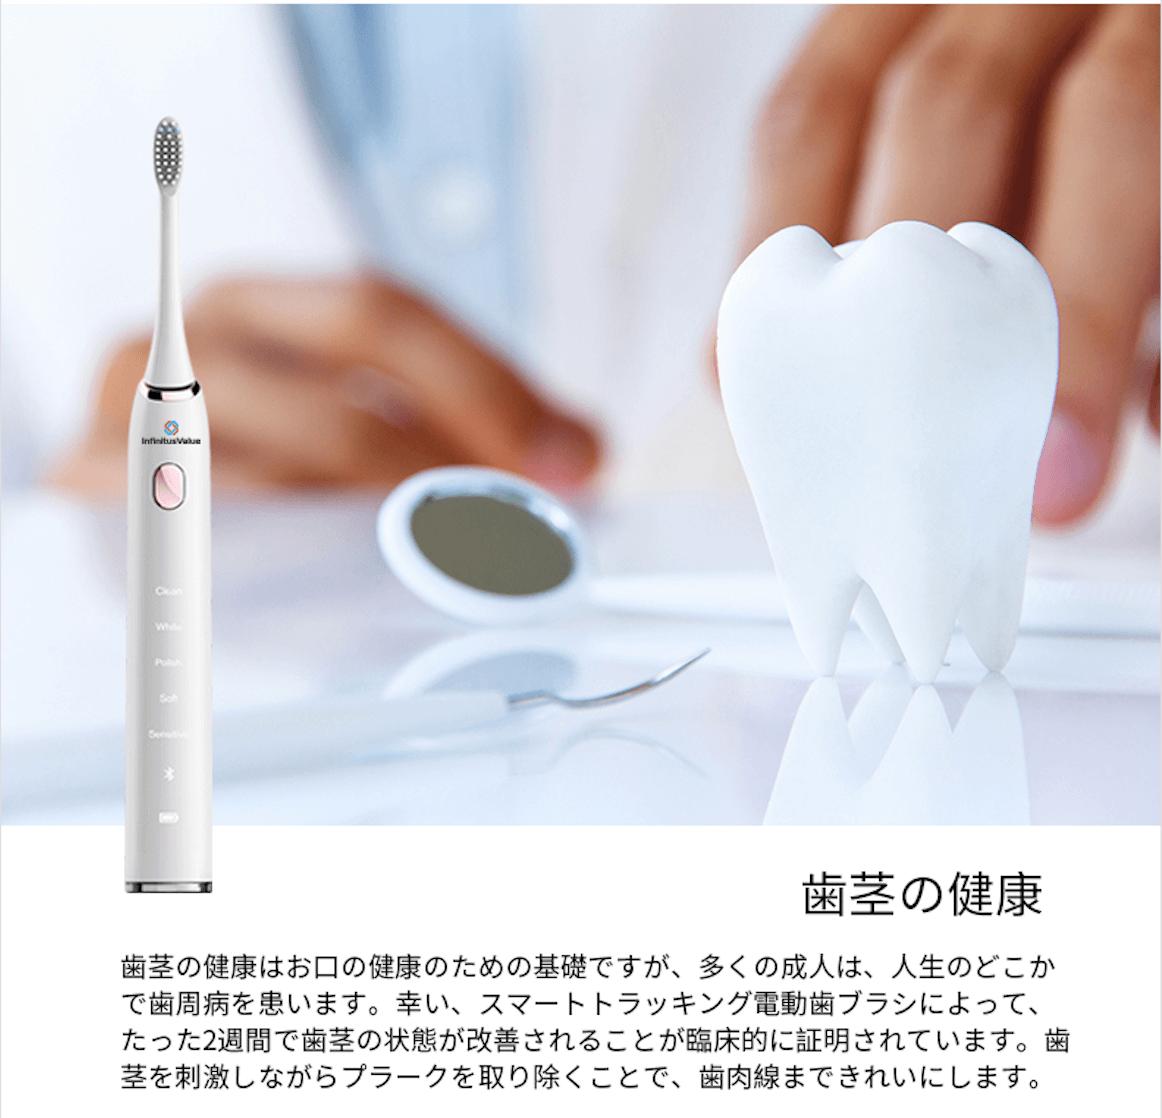 InfinitusValue スマートトラッキング電動歯ブラシ ブラック IVHB01B